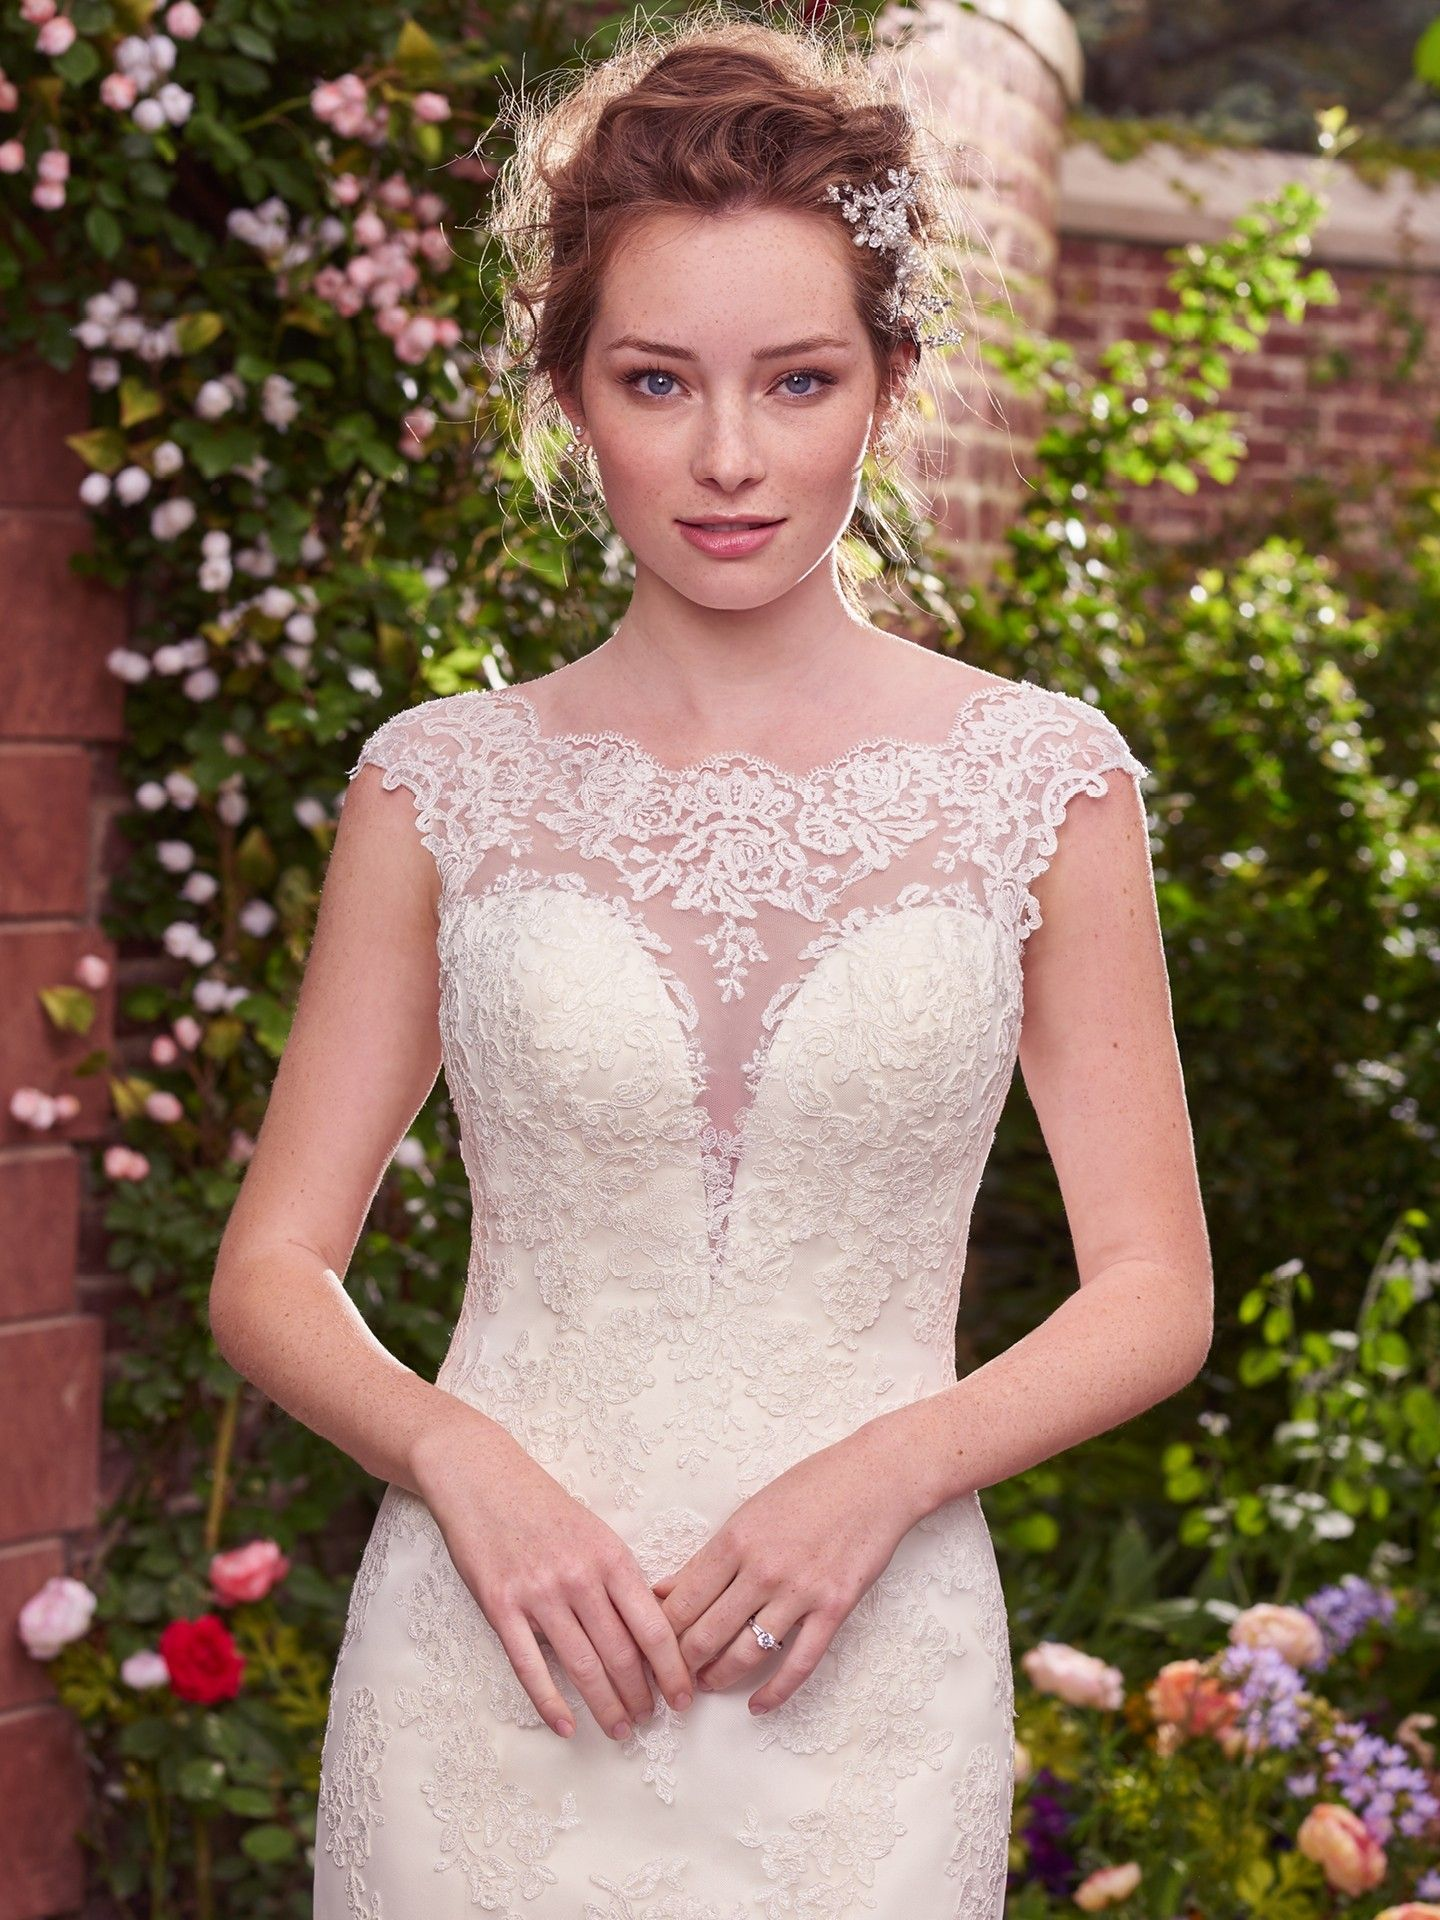 Wedding dress for body type  Weuve Found the Perfect Dress for Your Body Type  Wedding stuff